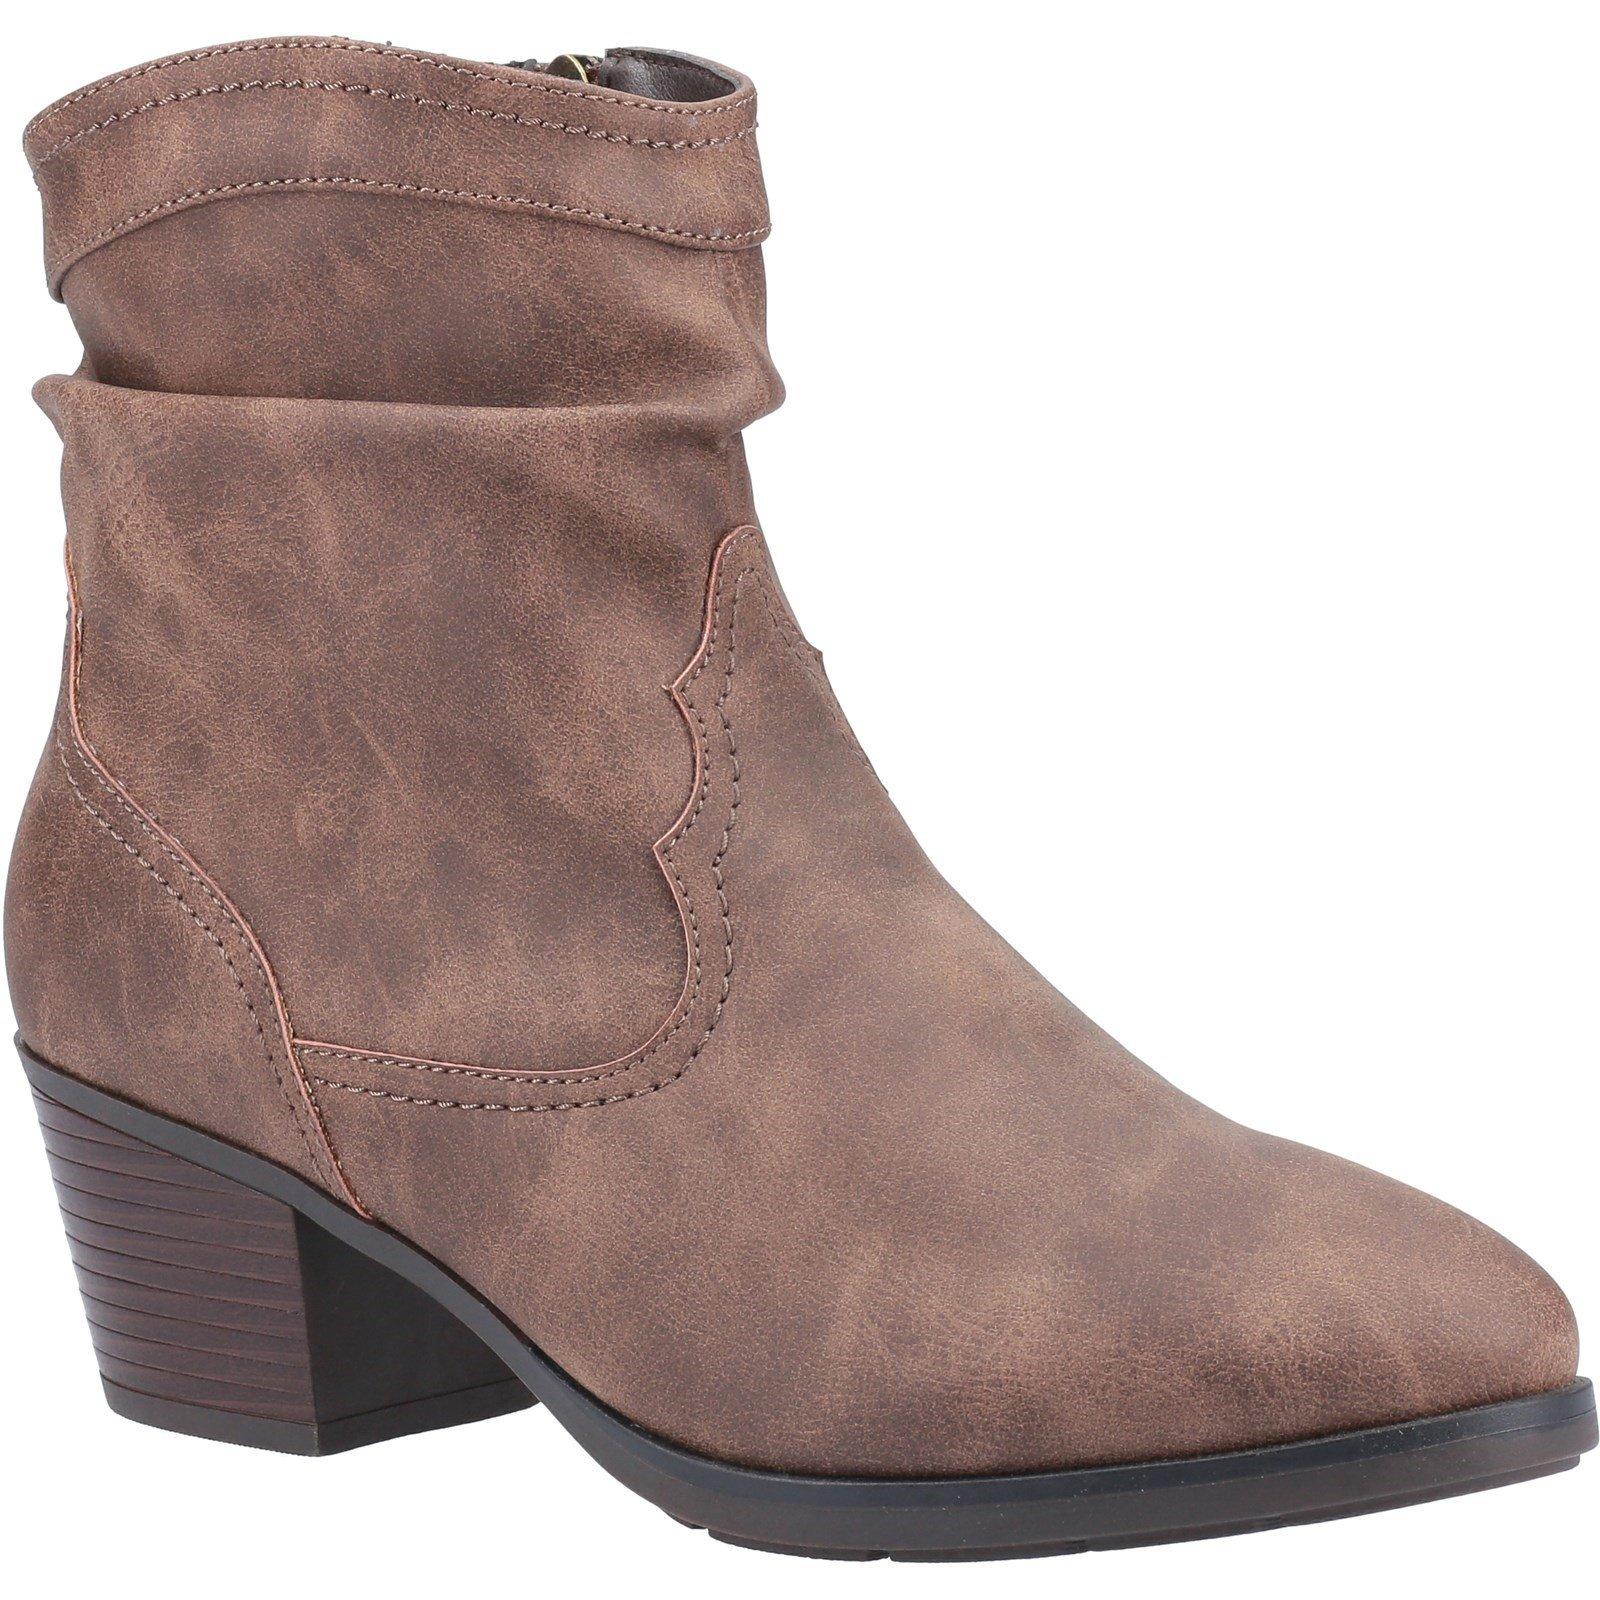 Divaz Women's Adele Ankle Boot Various Colours 33028 - Tan 3